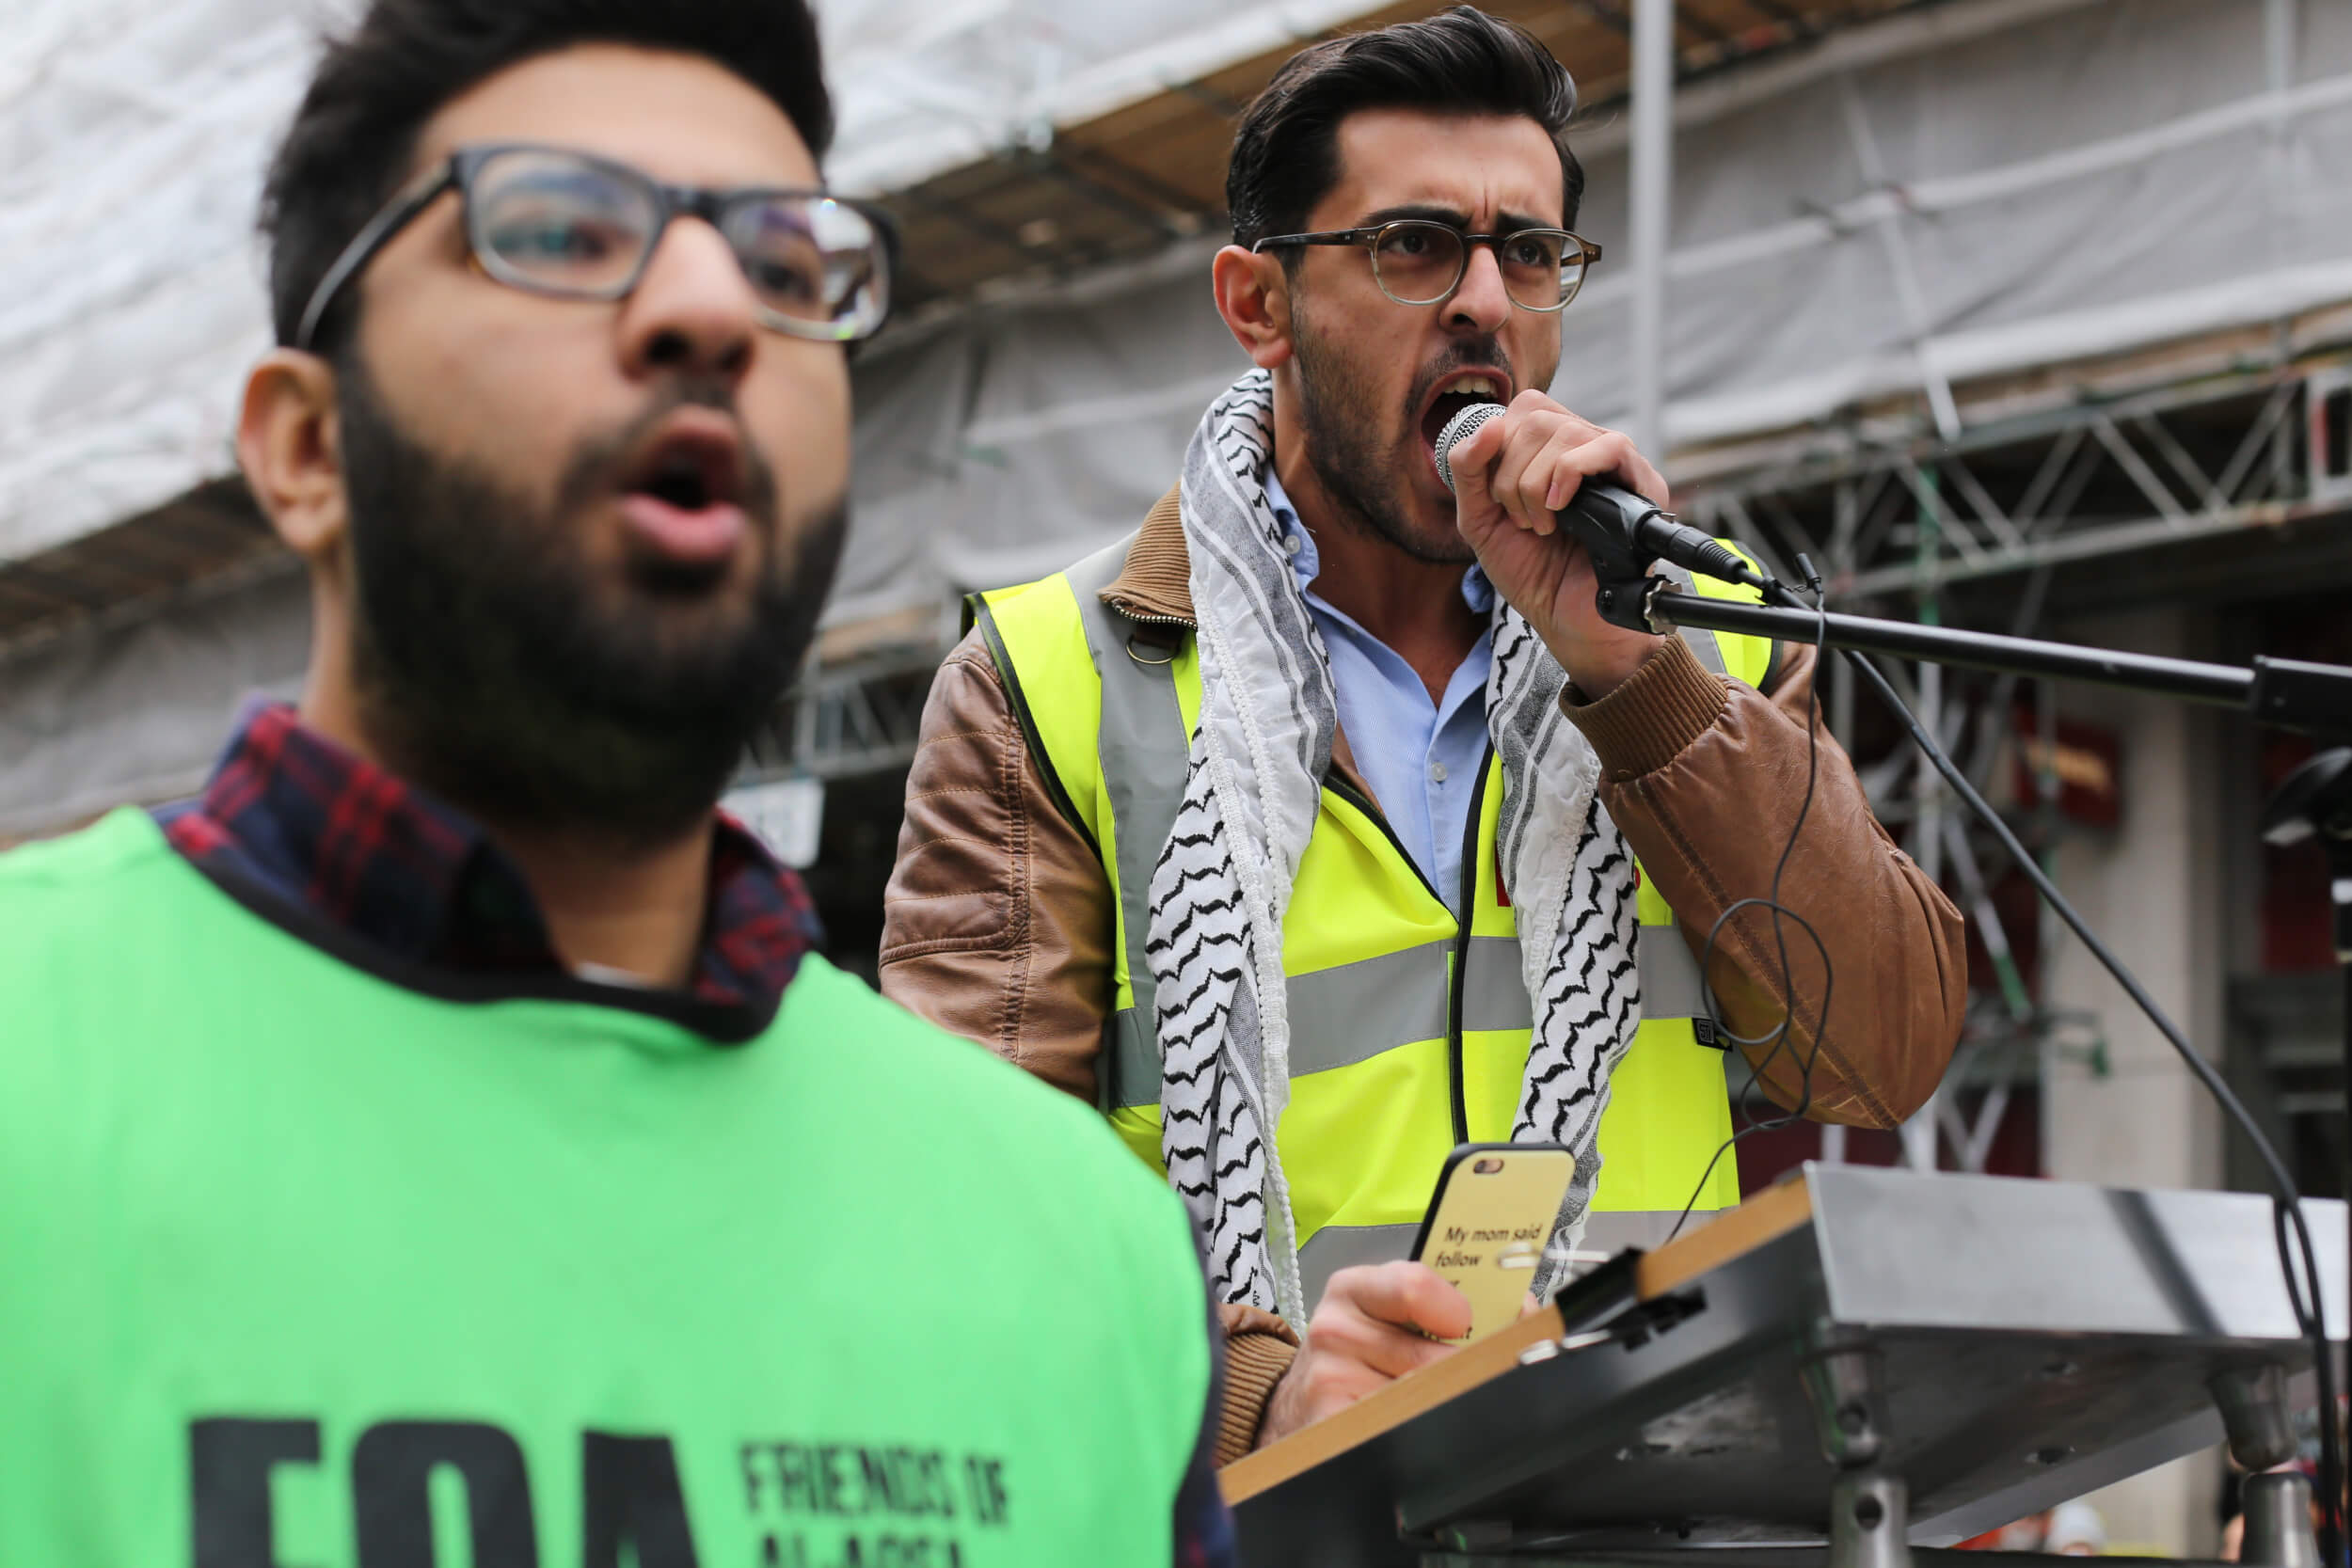 Yaman Birawi from the Palestinian Forum in Britain. (Photo: Sara Anna)